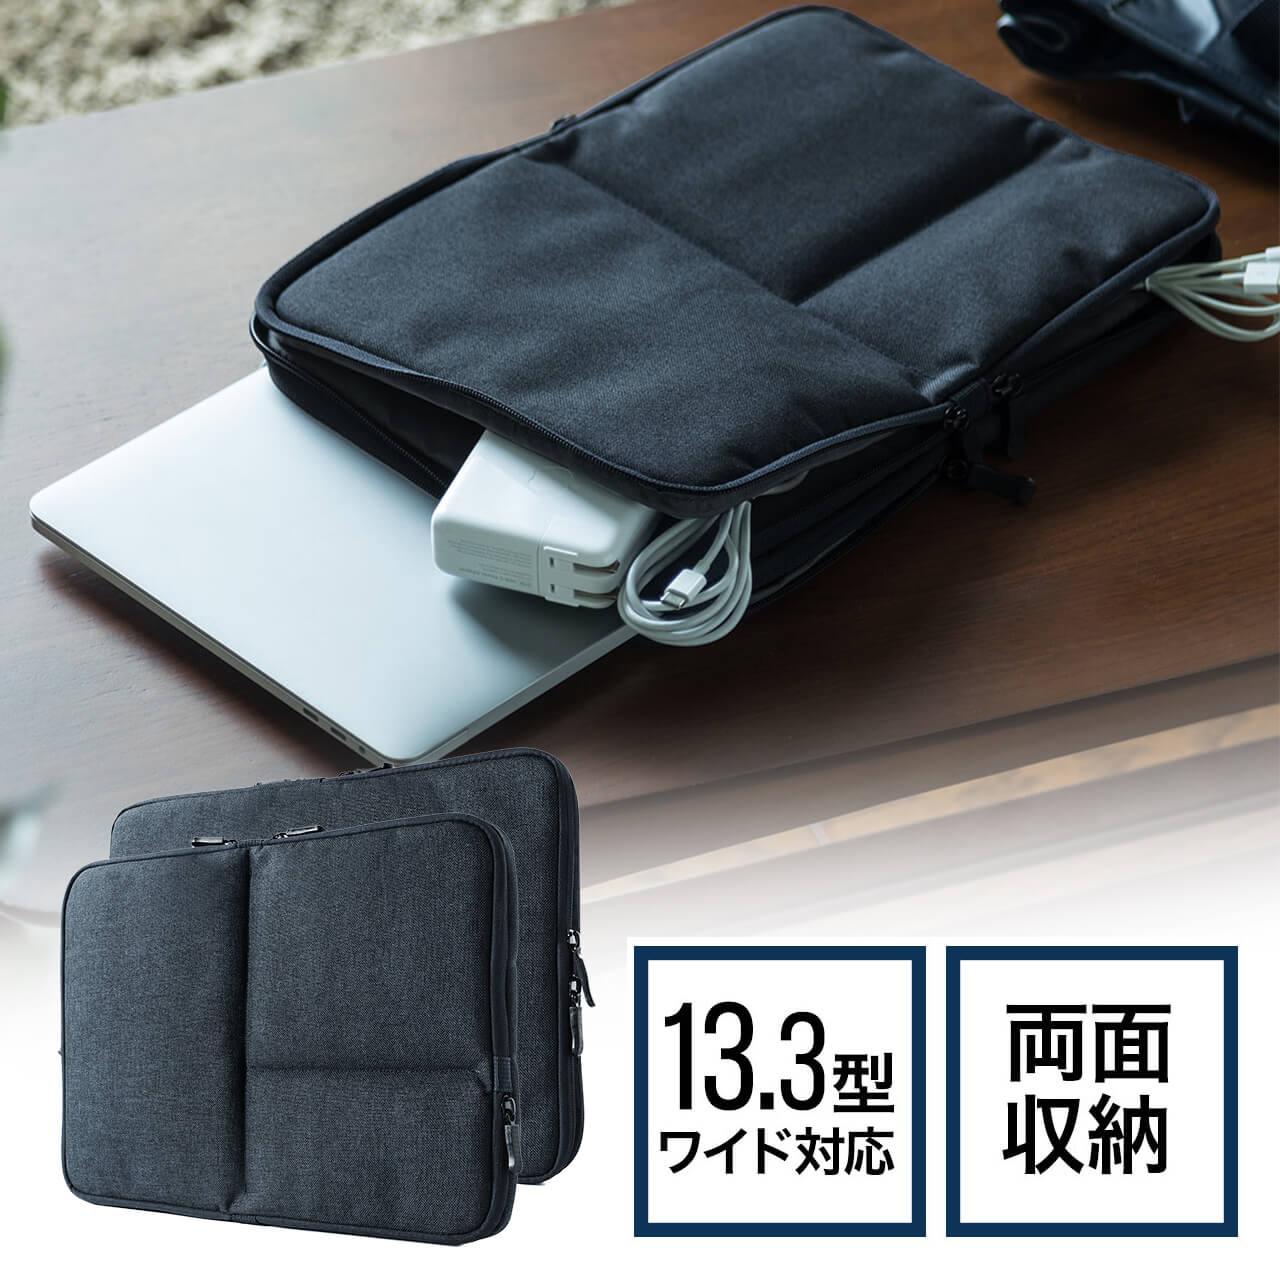 PCインナーケース(13.3インチ対応・両面収納・Surface Pro 4/iPad Pro 12.9対応・ネイビー) サンワダイレクト サンワサプライ 200-IN050NV